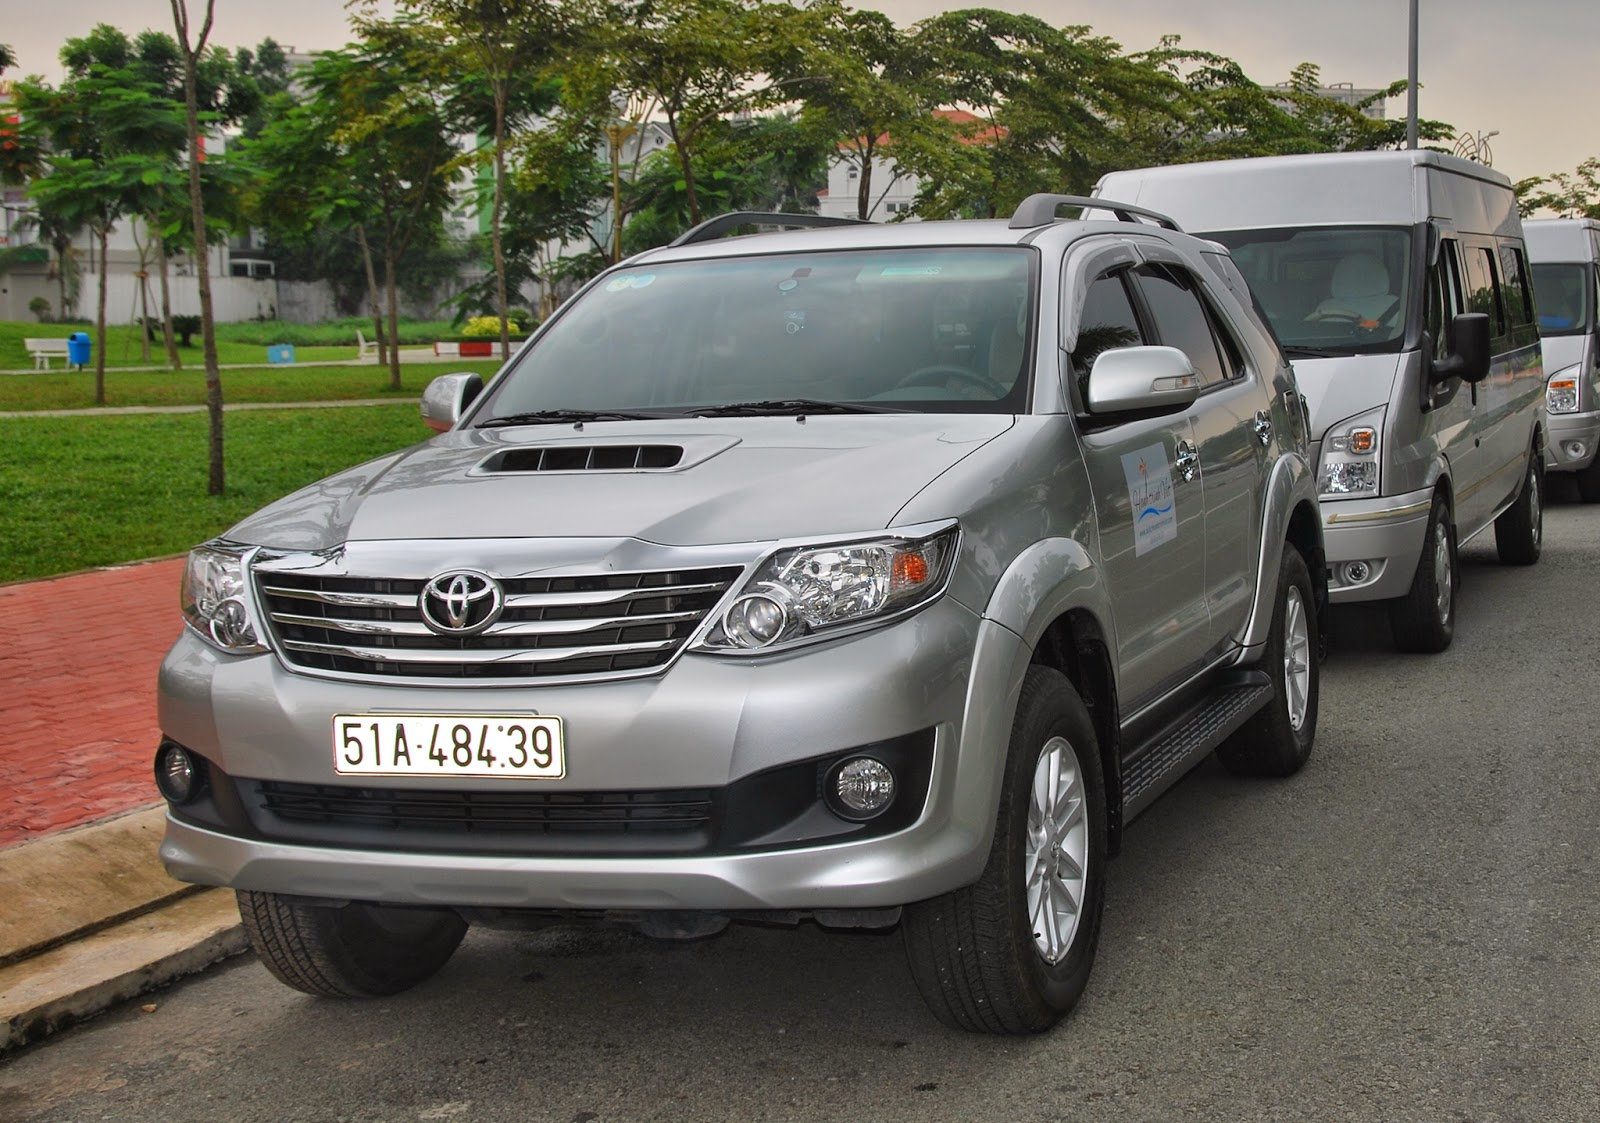 Hanh Trinh Viet car rental hcmc